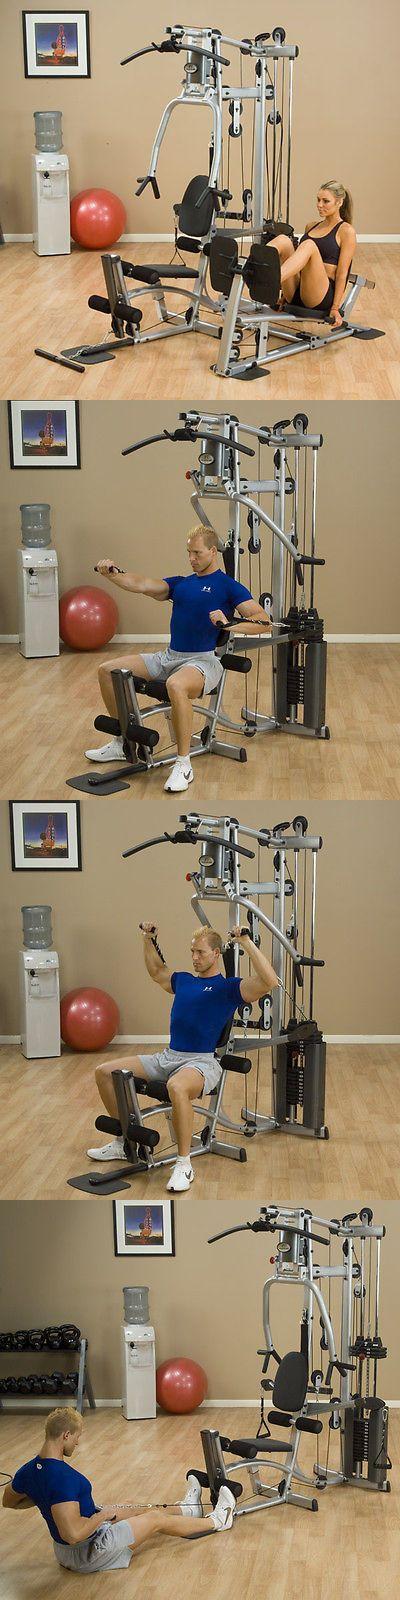 Best ideas about leg press on pinterest